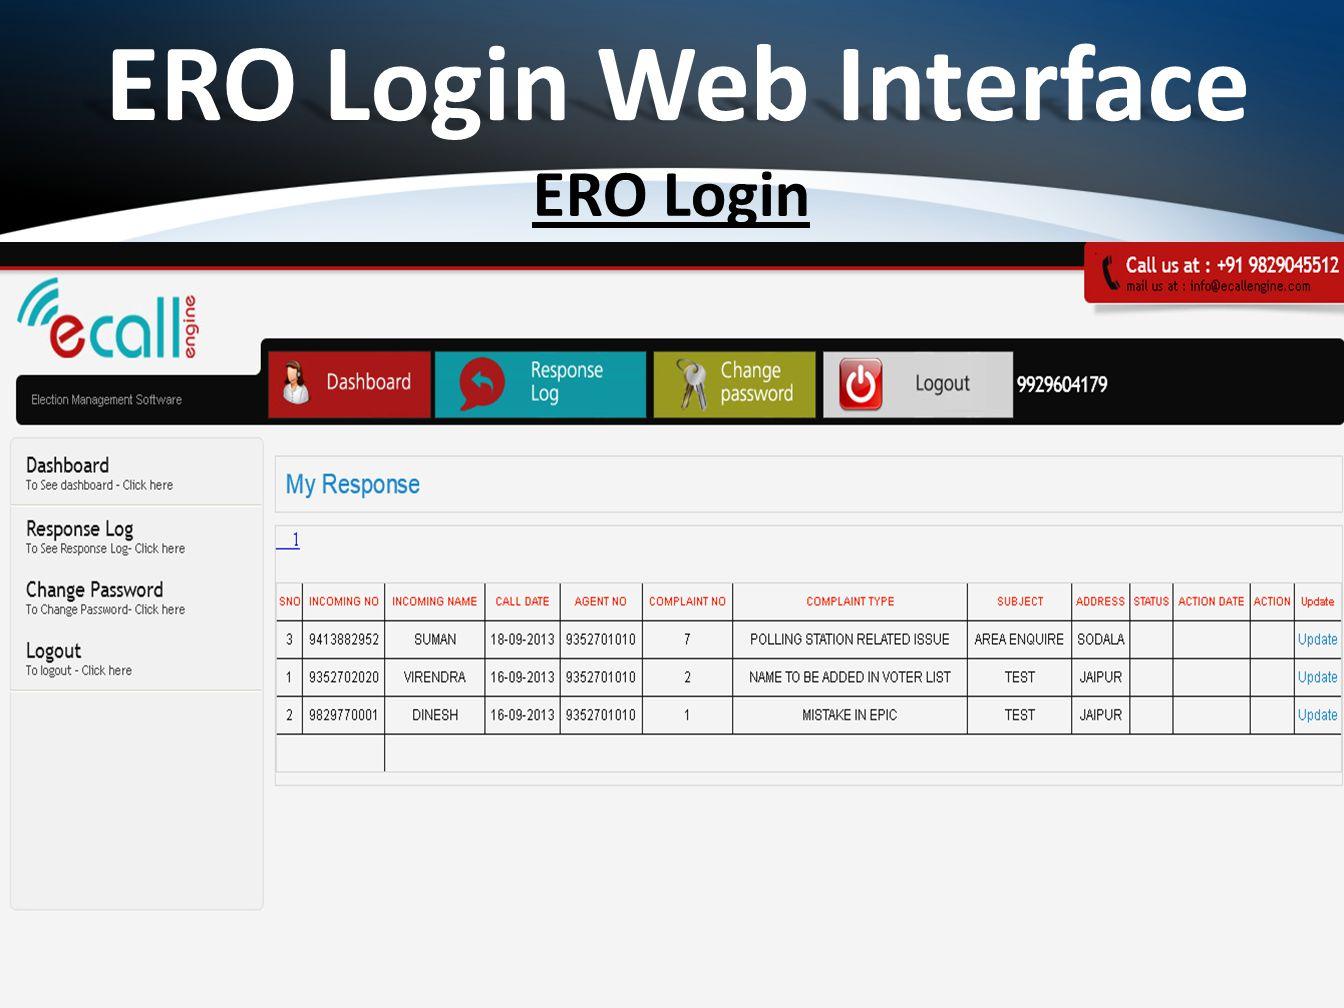 ERO Login ERO Login Web Interface